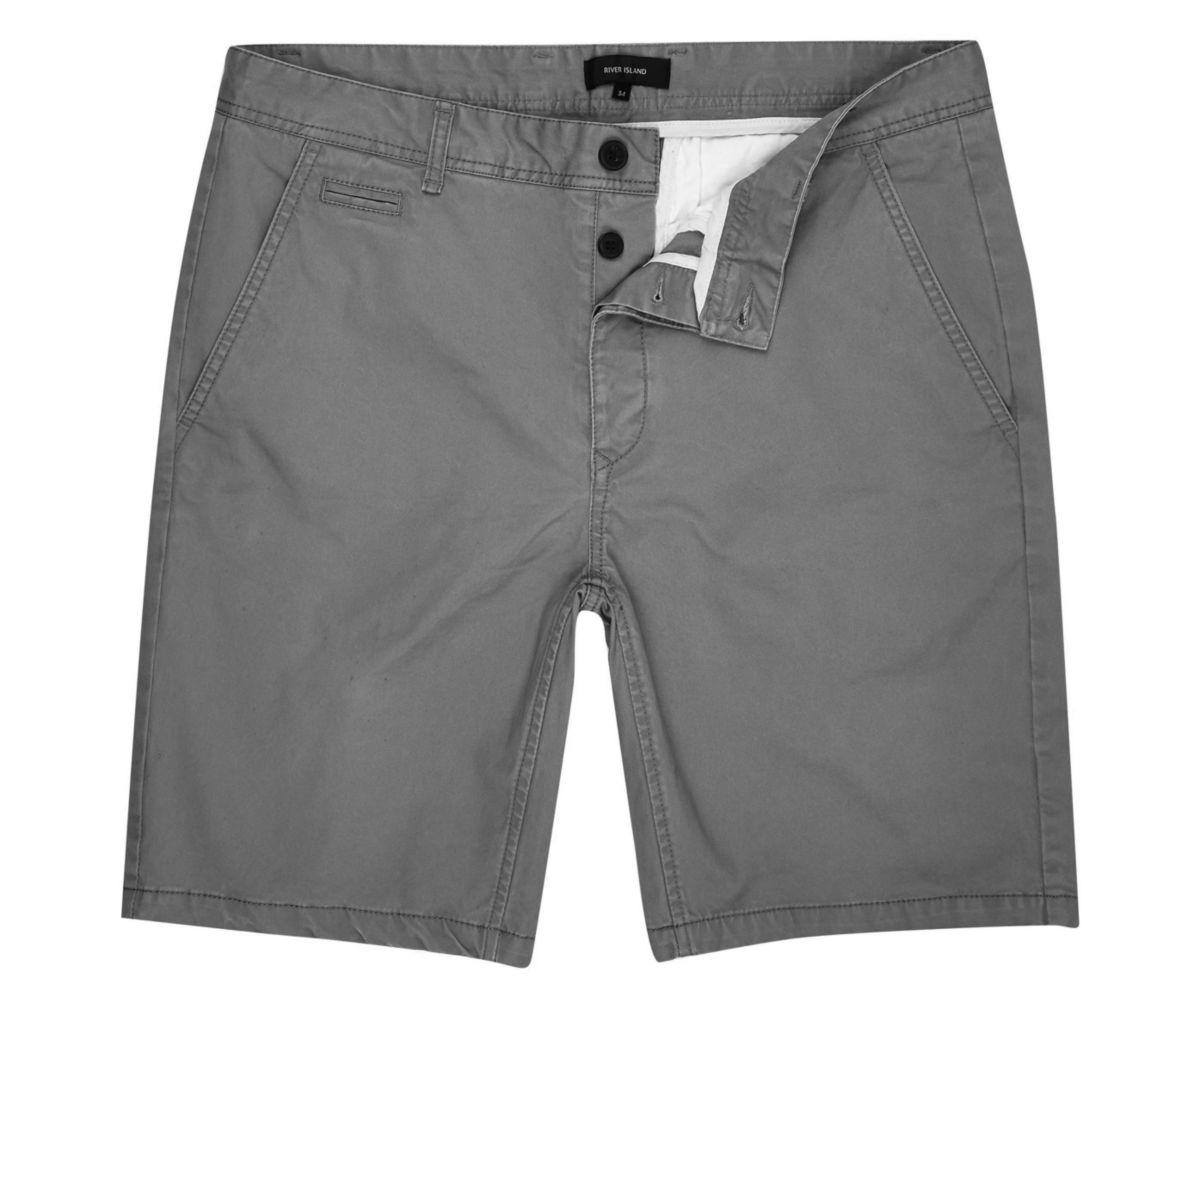 Big and Tall grey slim fit shorts